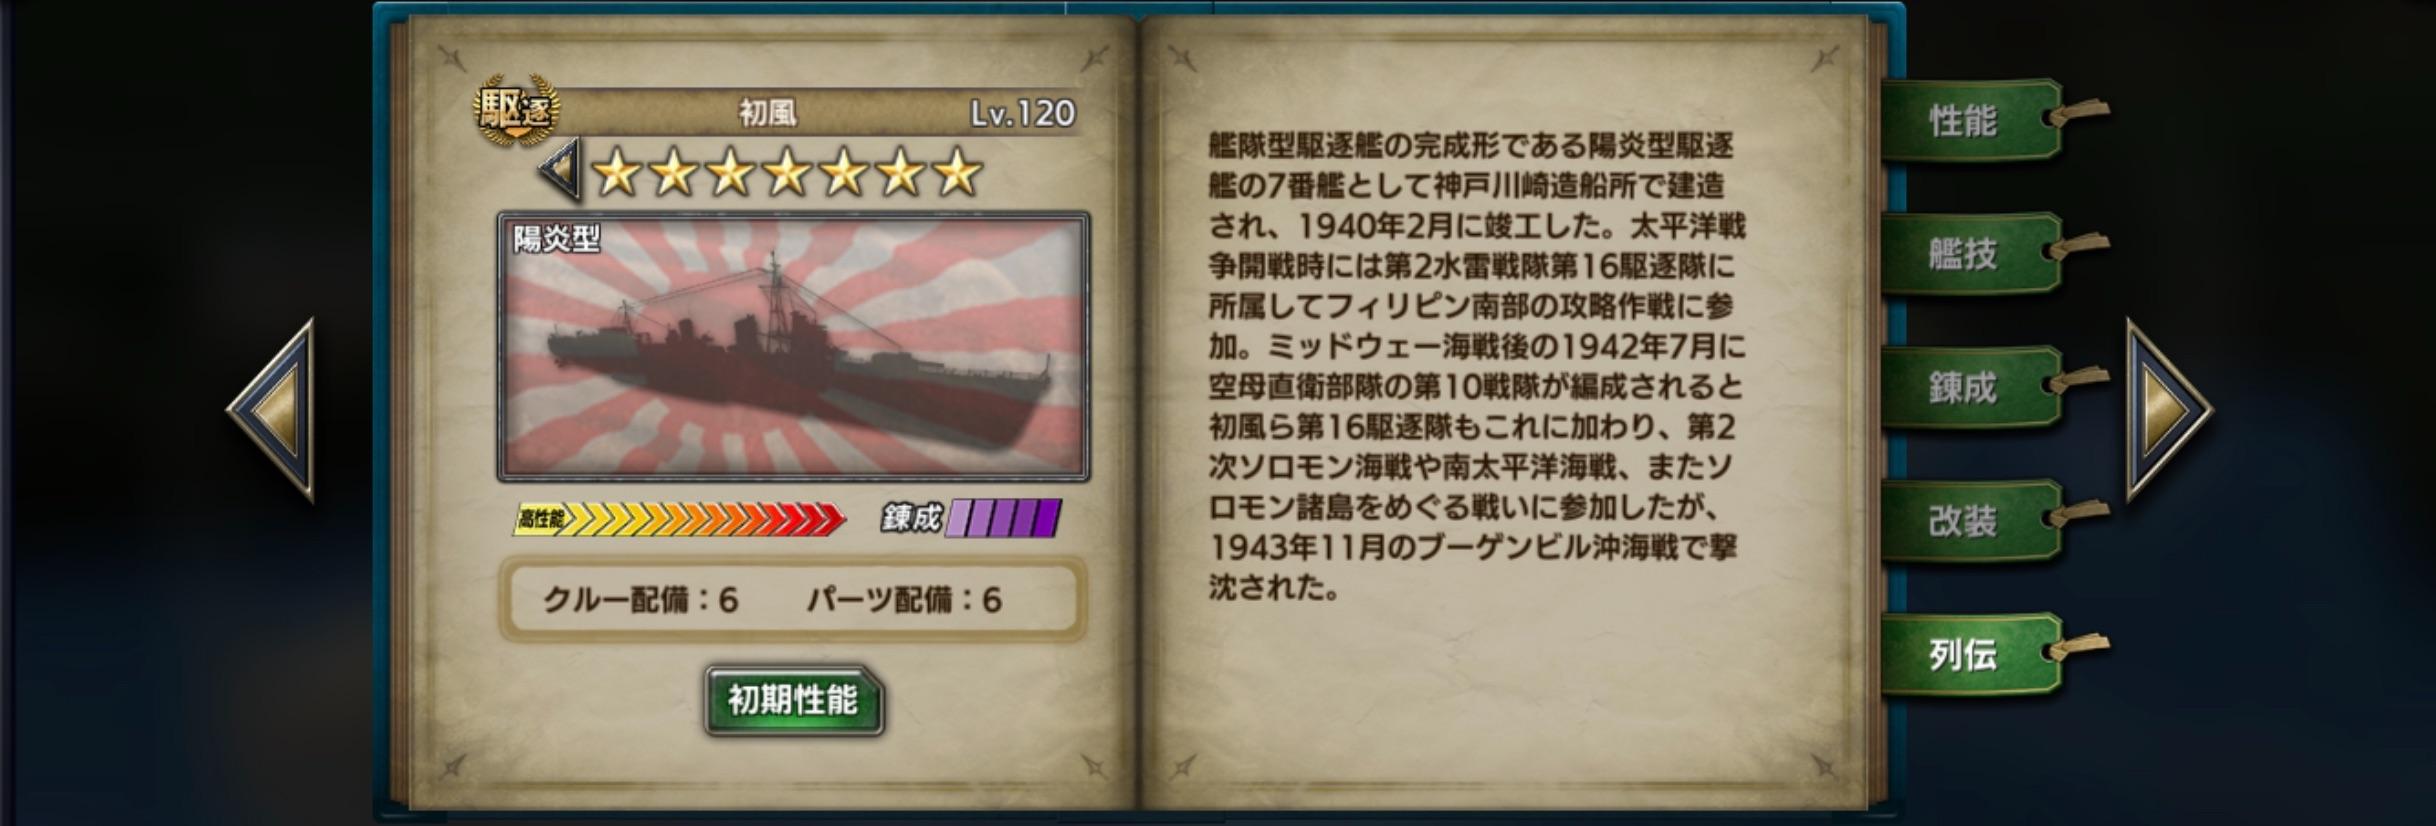 Hatsukaze-history